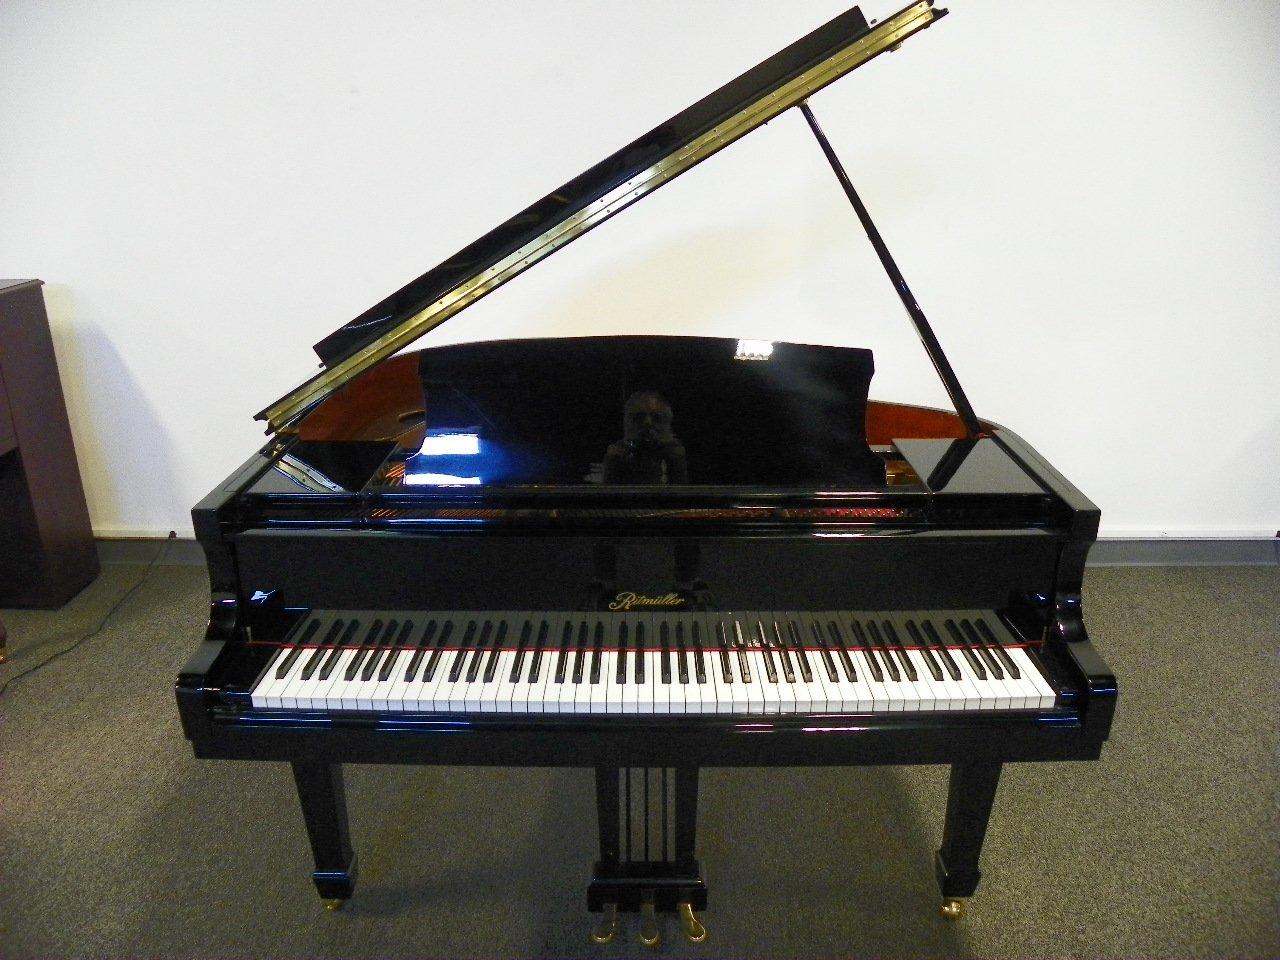 Ritmuller Piano | England Piano